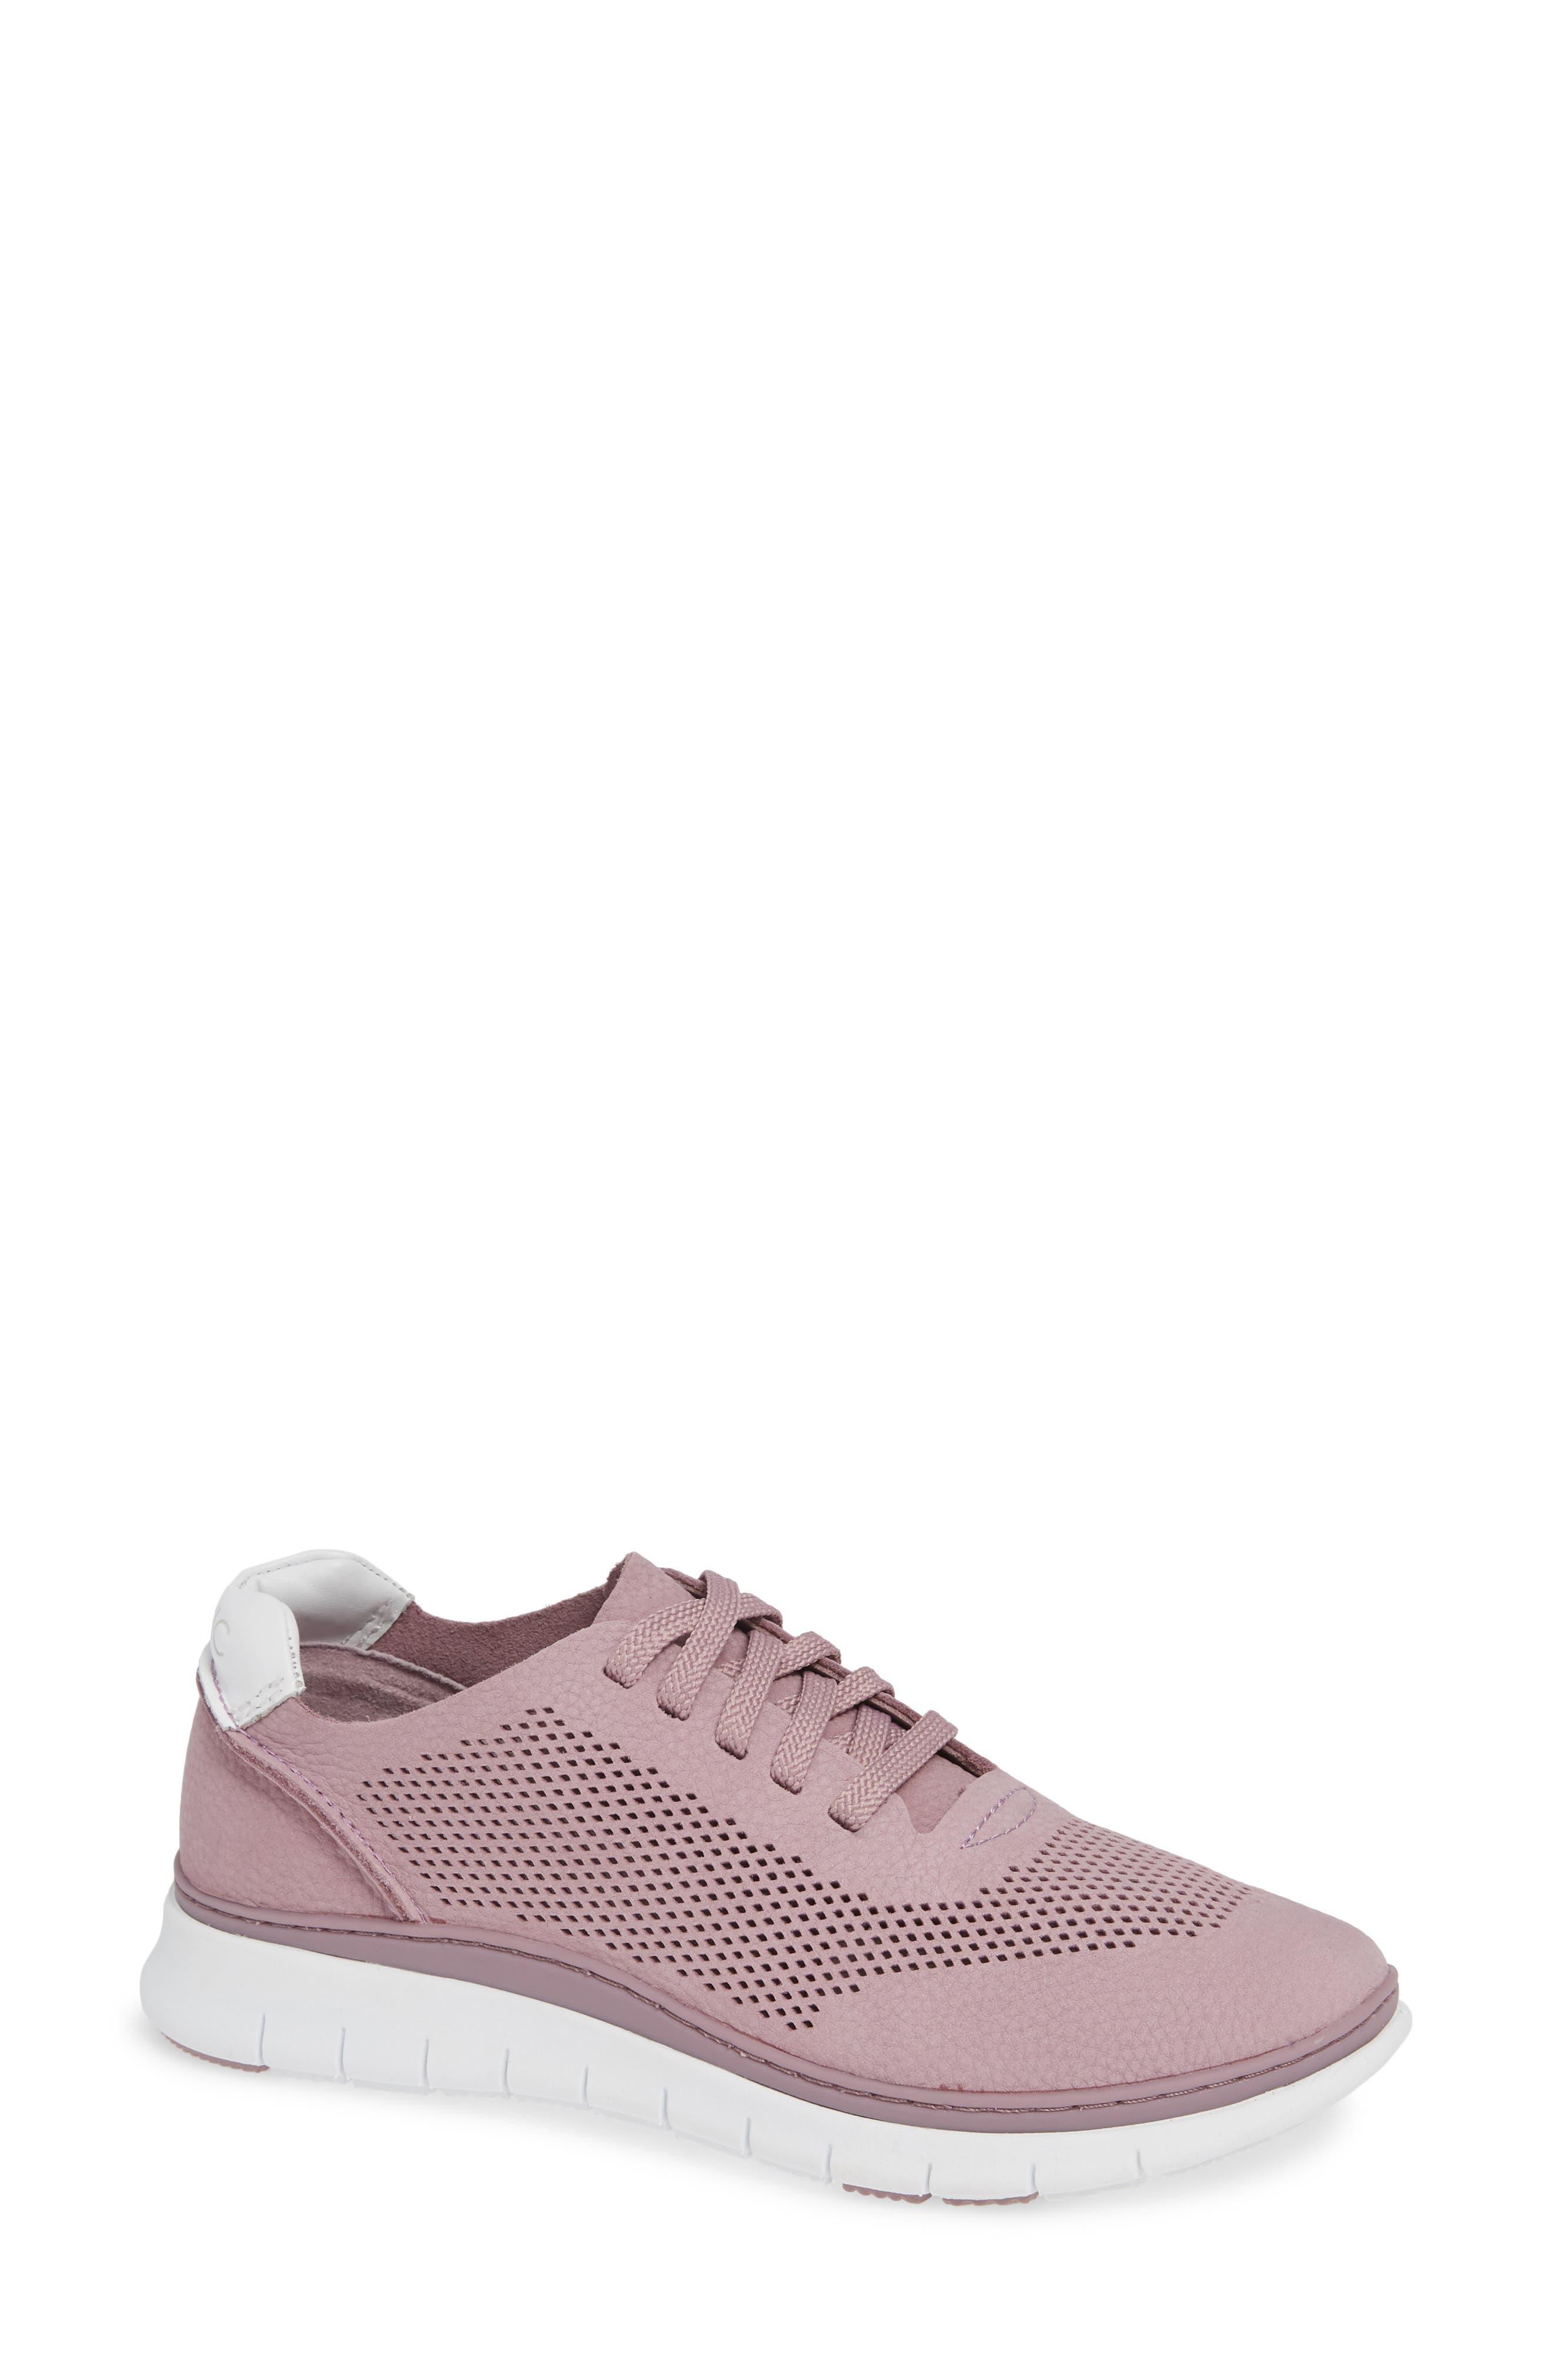 6d5b17531 Women's Vionic Sneakers & Running Shoes | Nordstrom